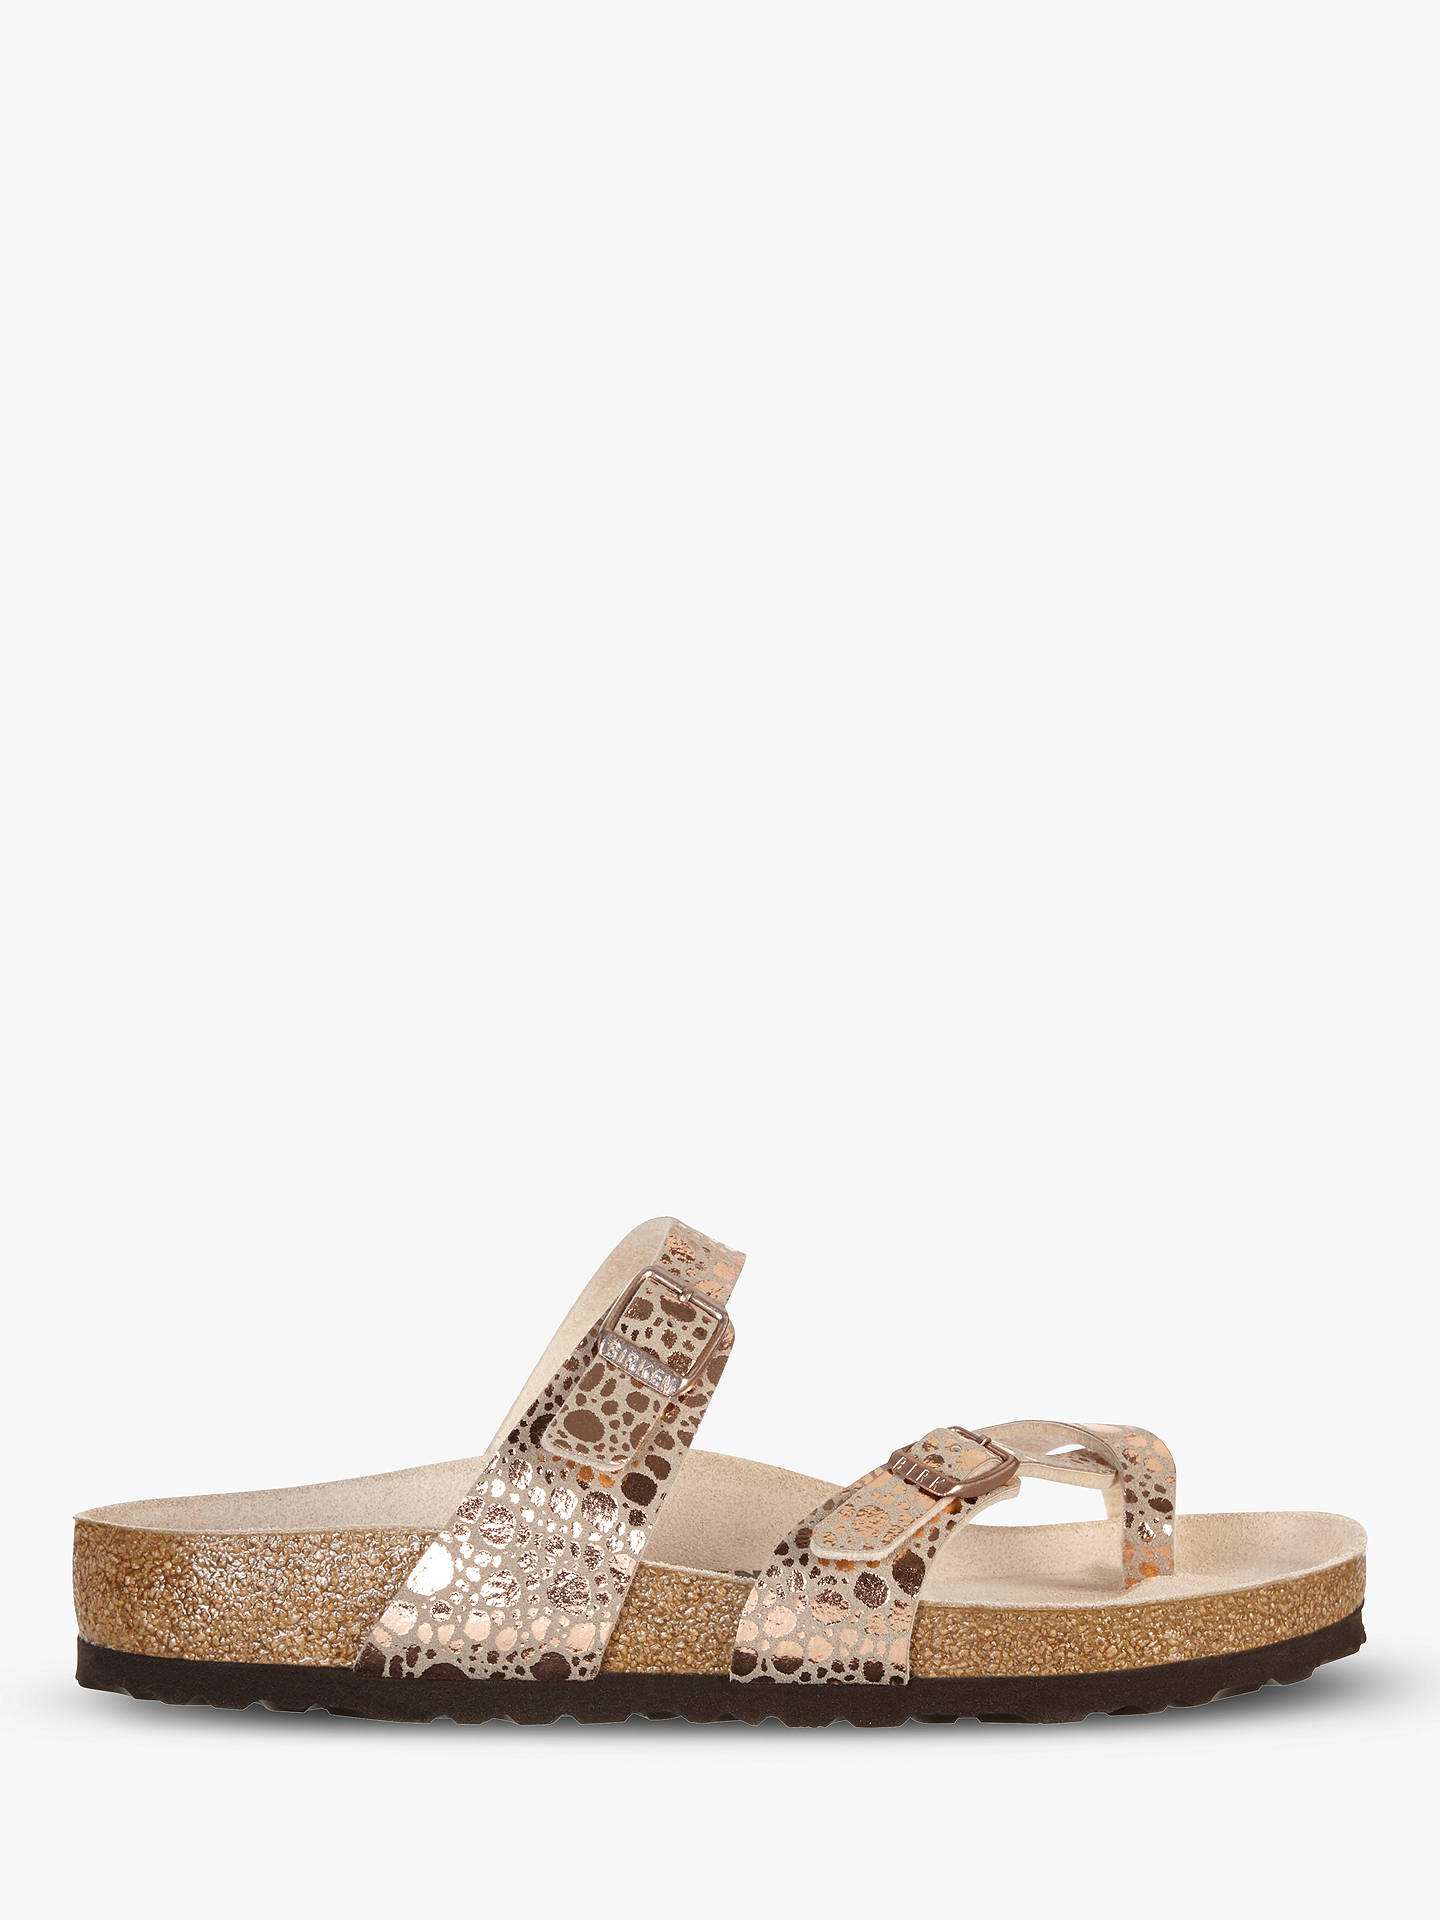 b7f1df5d51d Birkenstock Mayari Double Strap Scissor Toe Sandals